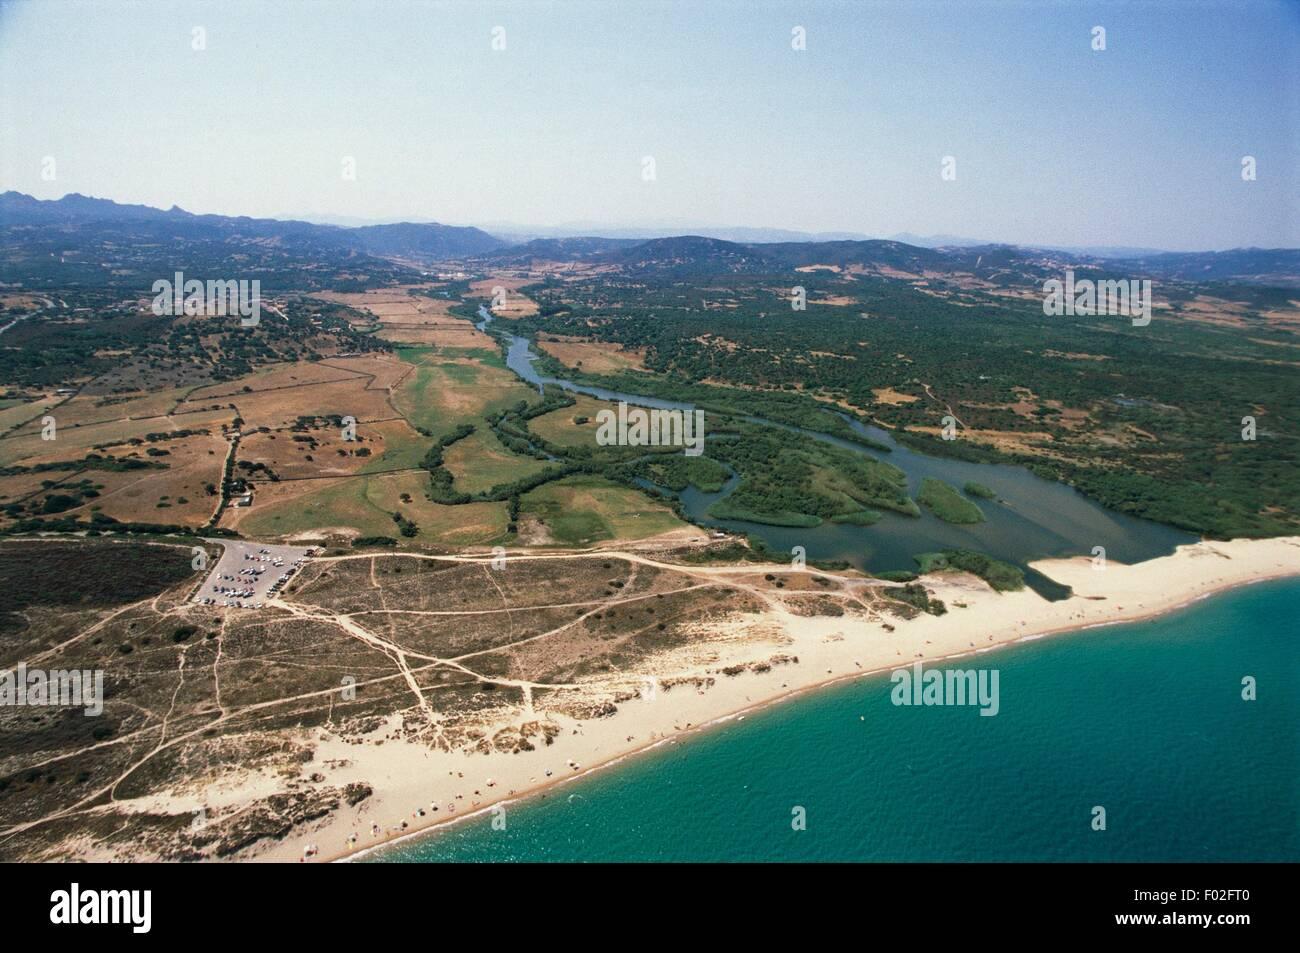 Aerial view of the mouth of river Liscia at Porto Raphael, Palau - Province of Olbia-Tempio, Sardinia Region, Italy - Stock Image